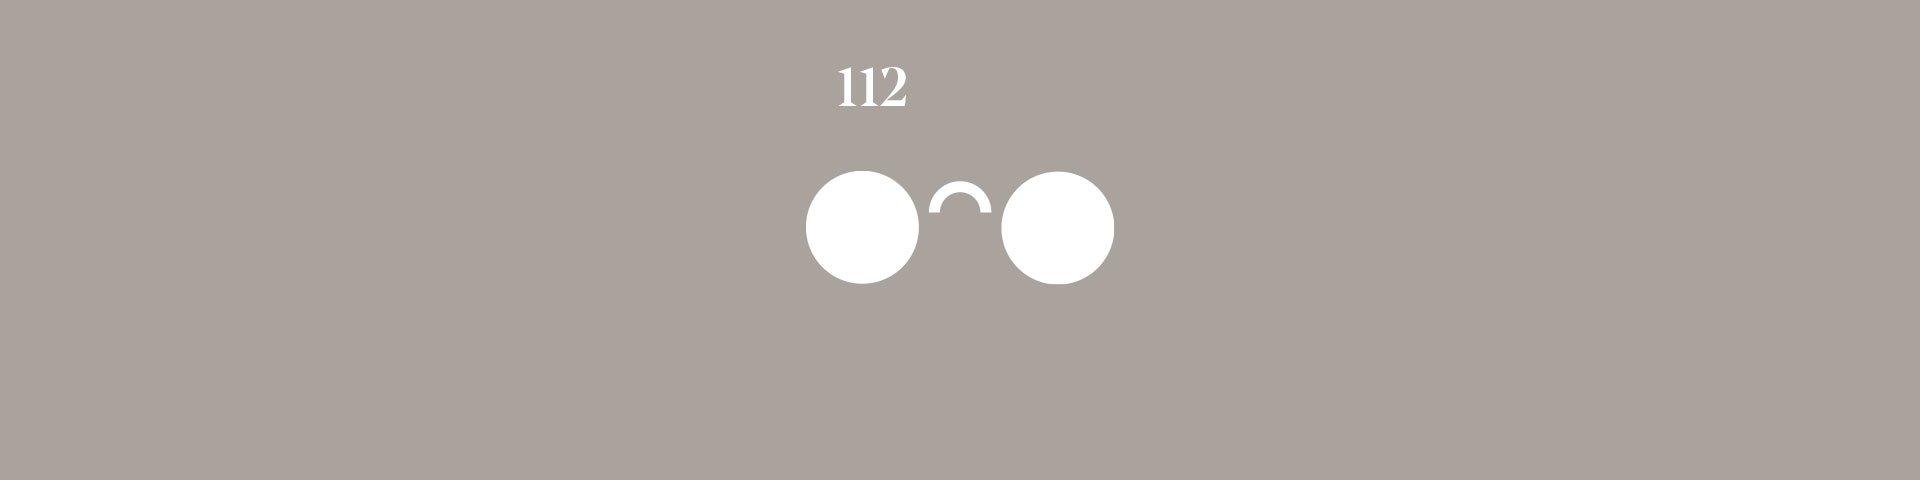 "Premieres and (Re)premieres 112. ""Proyecto Conrado"": Complete quartets (I)"